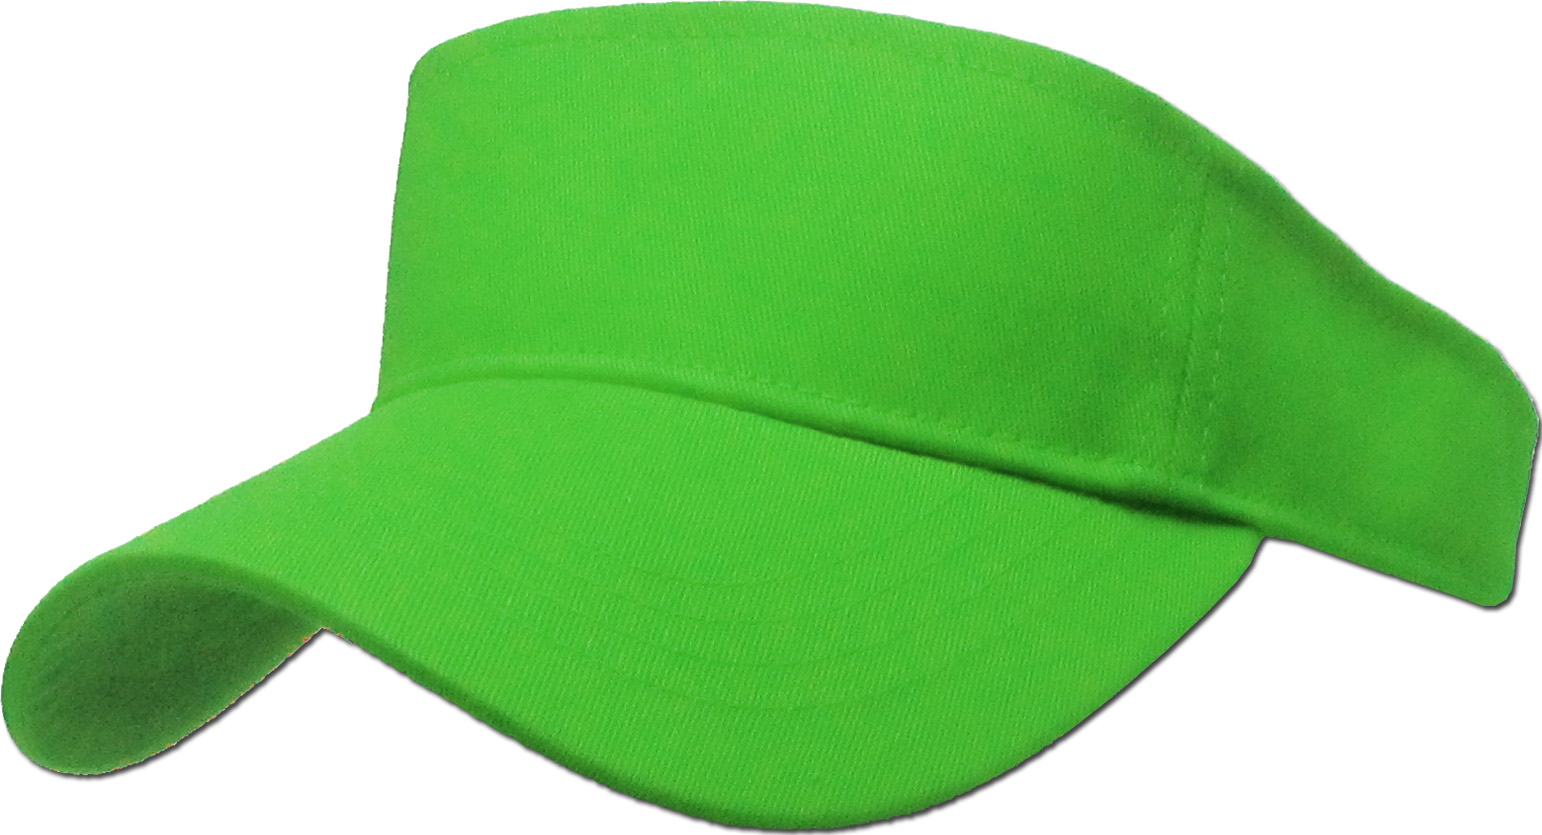 Sun Visor Plain Hat Sports Cap Golf Tennis New Adjustable Men Women by